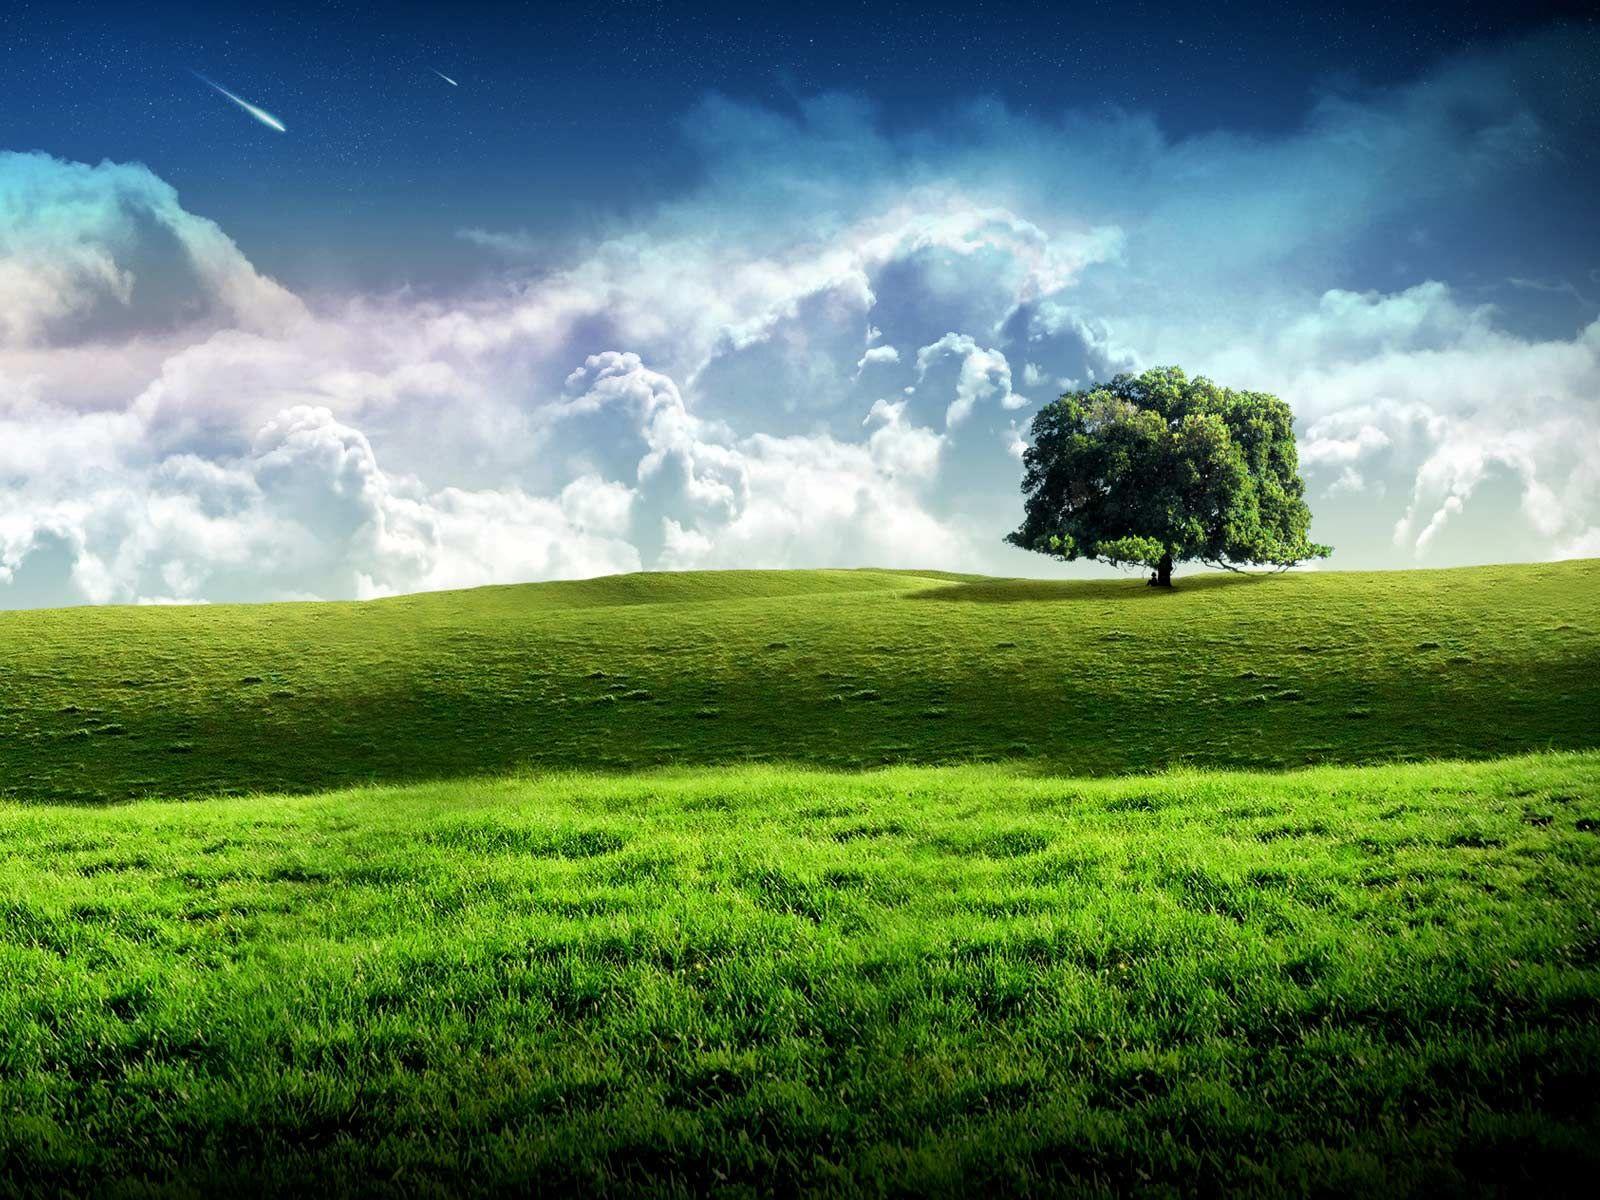 Wallpaper Fondo De Pantalla Verde Imagen Gratis En Pixabay: Paisajes Verdes Hd